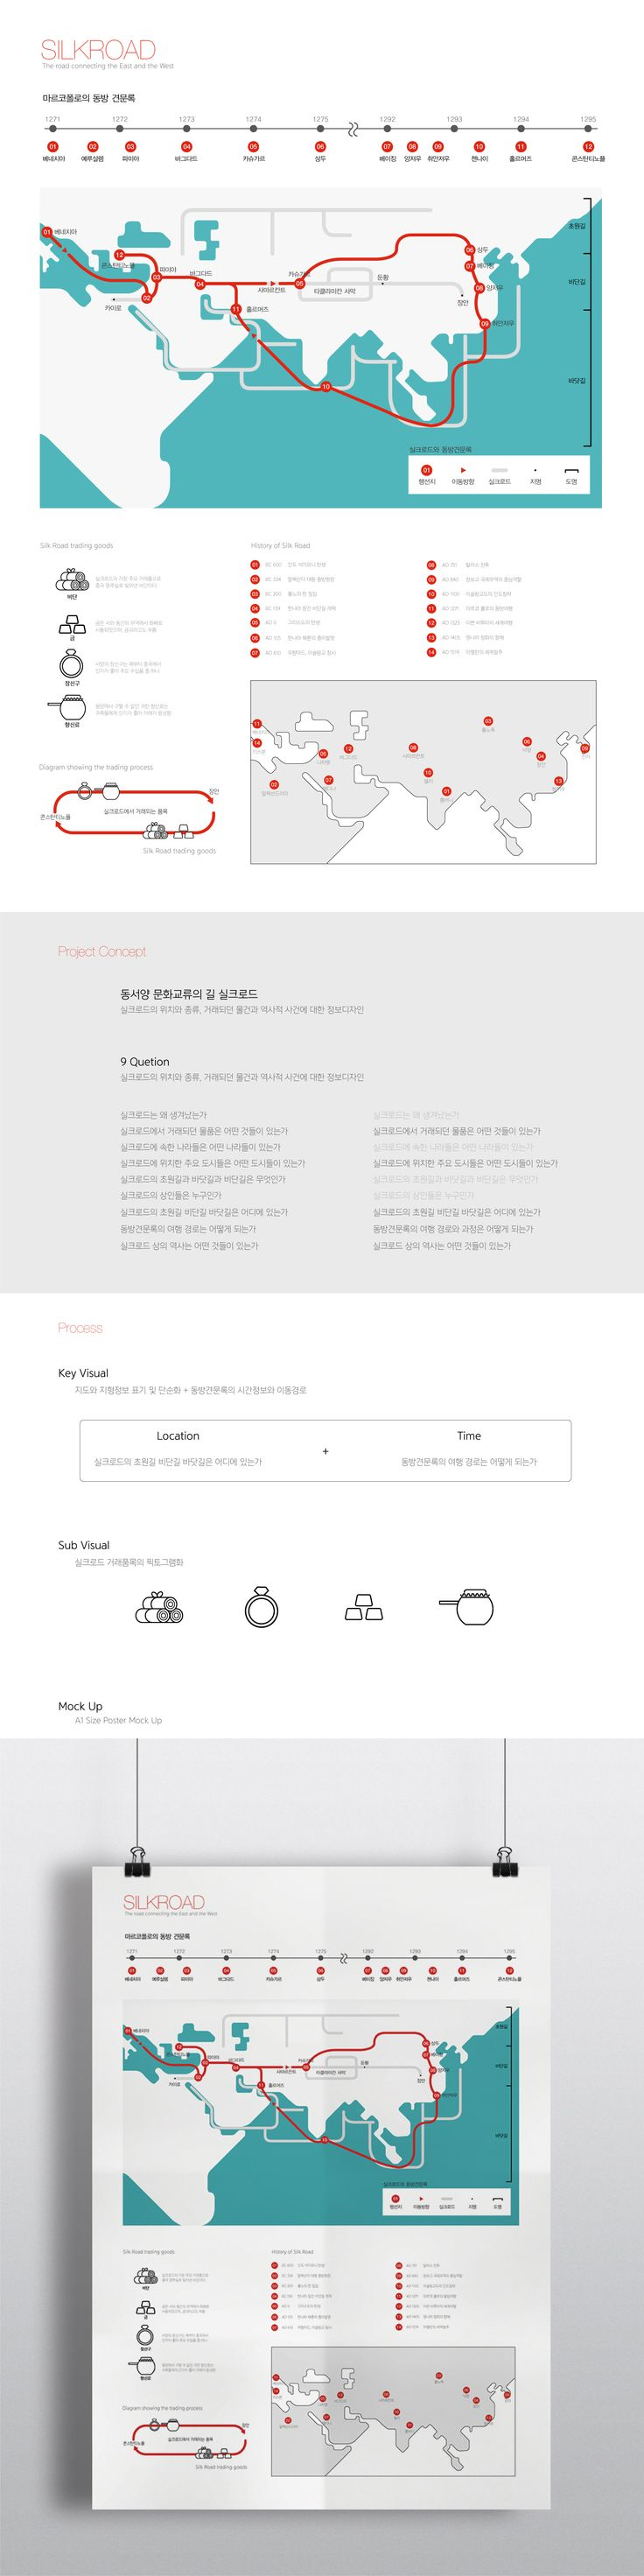 Kim Kihyun│ Information Design 2015│ Major in Digital Media Design │#hicoda │hicoda.hongik.ac.kr